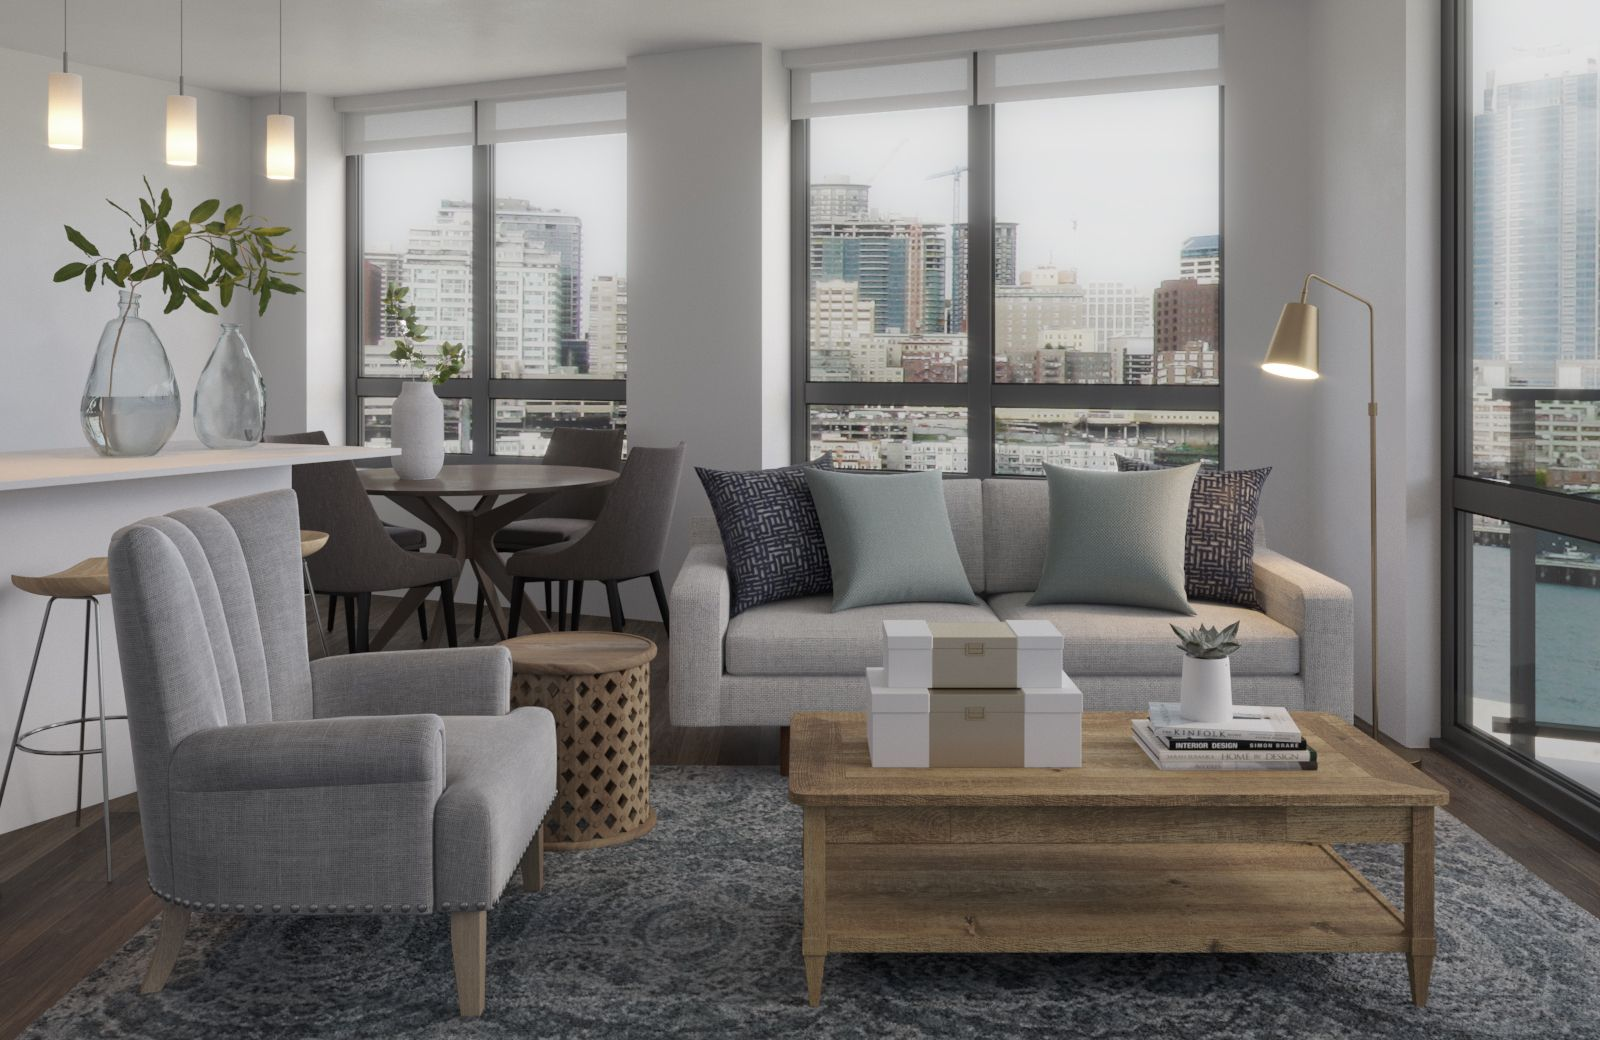 online interior design and home inspiration  online